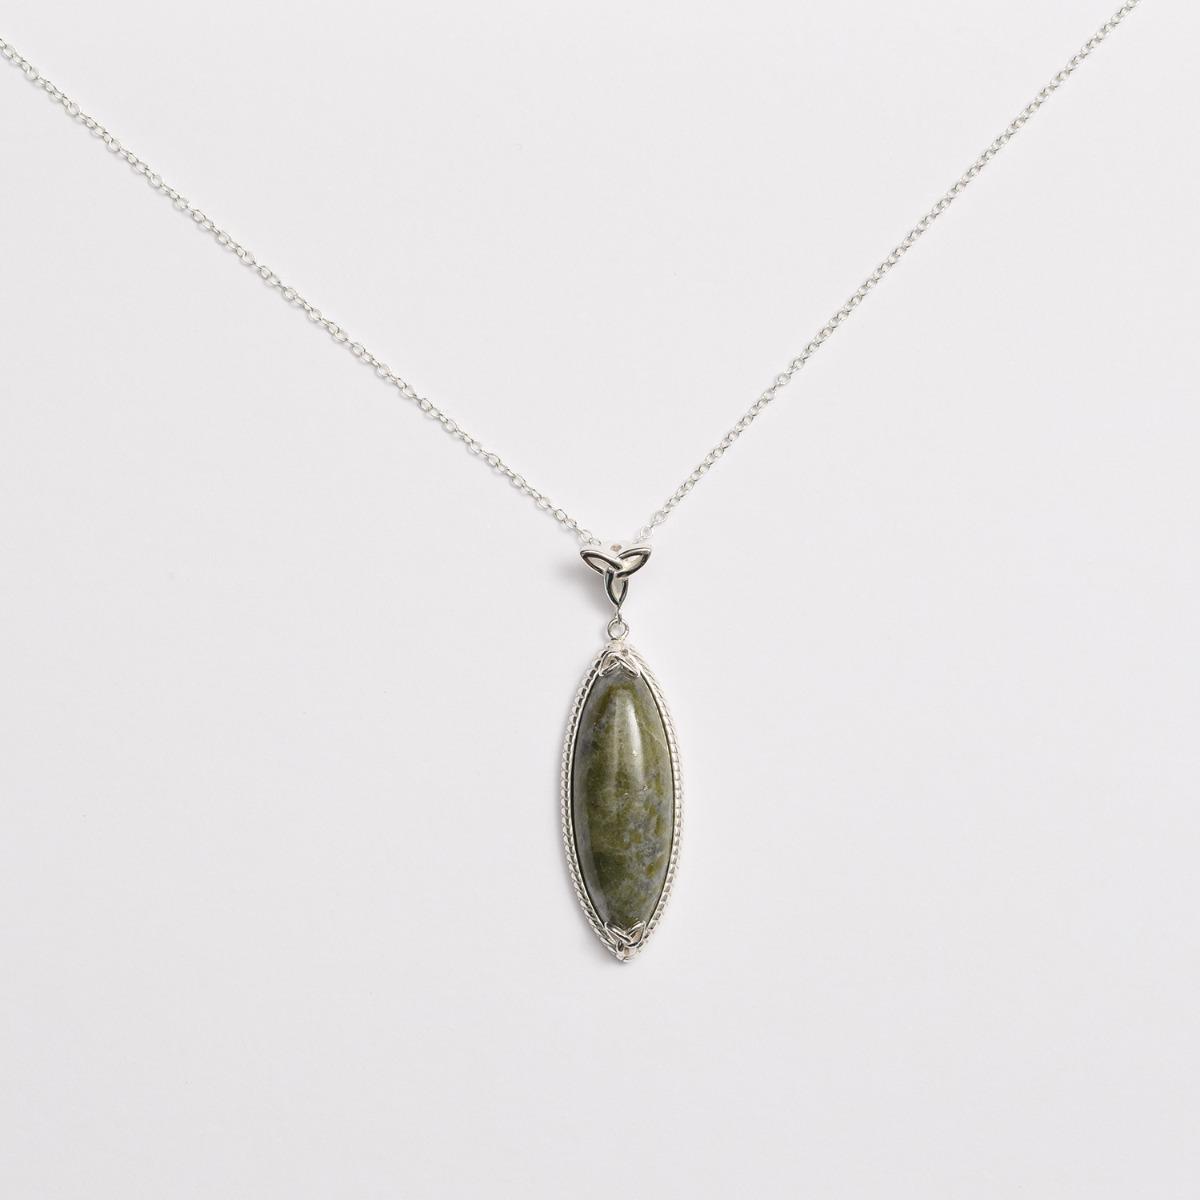 Connemara Marble pendant